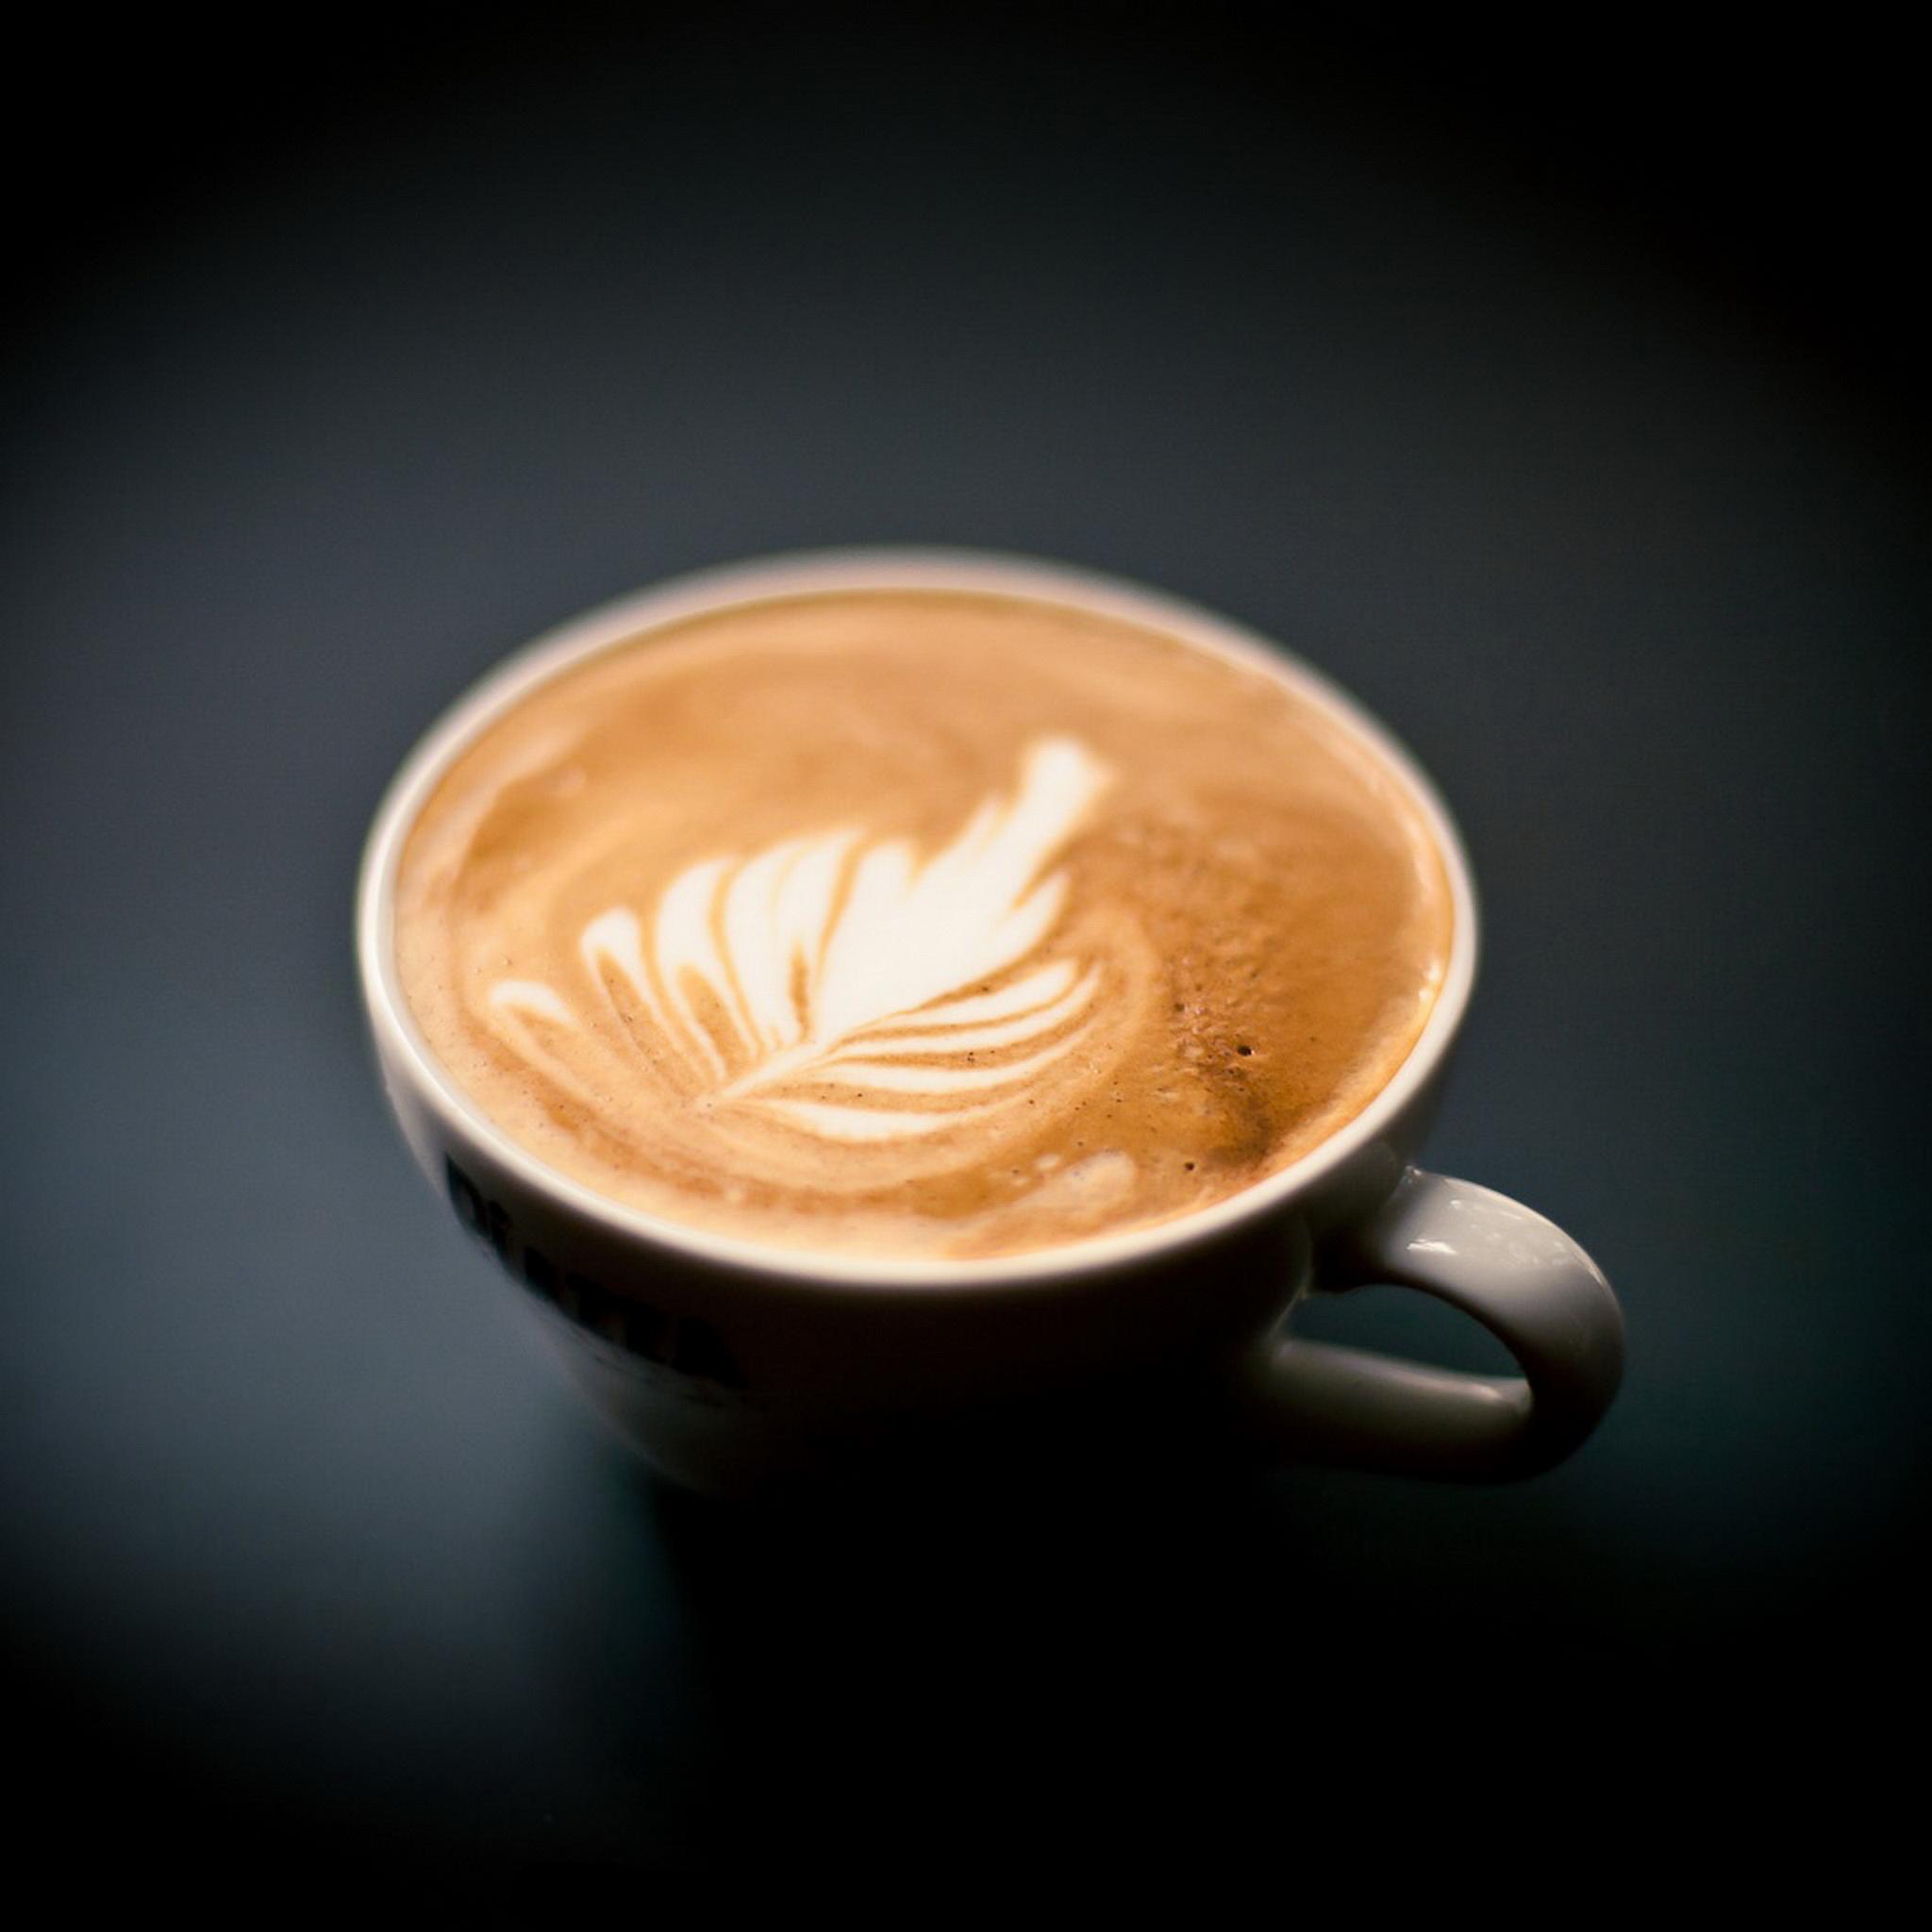 Coffee-3Wallpapers-iPad-Retina